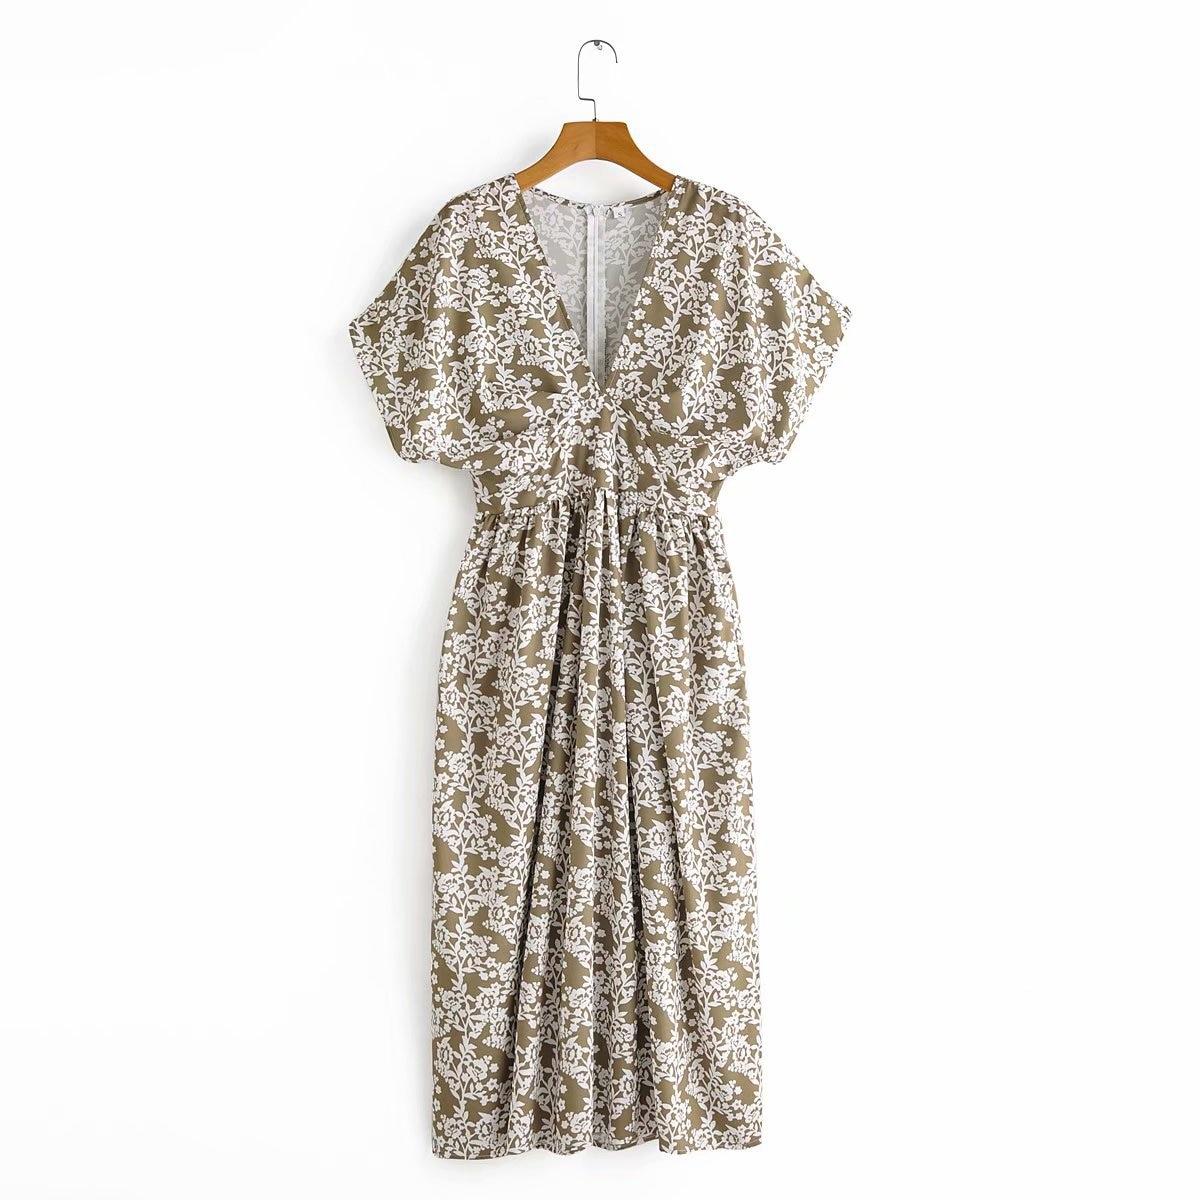 2020 New Spring Summer European Floral Printed Female Dress Zaraing Vadiming Sheining Women's Printed Dress Streetwear S481